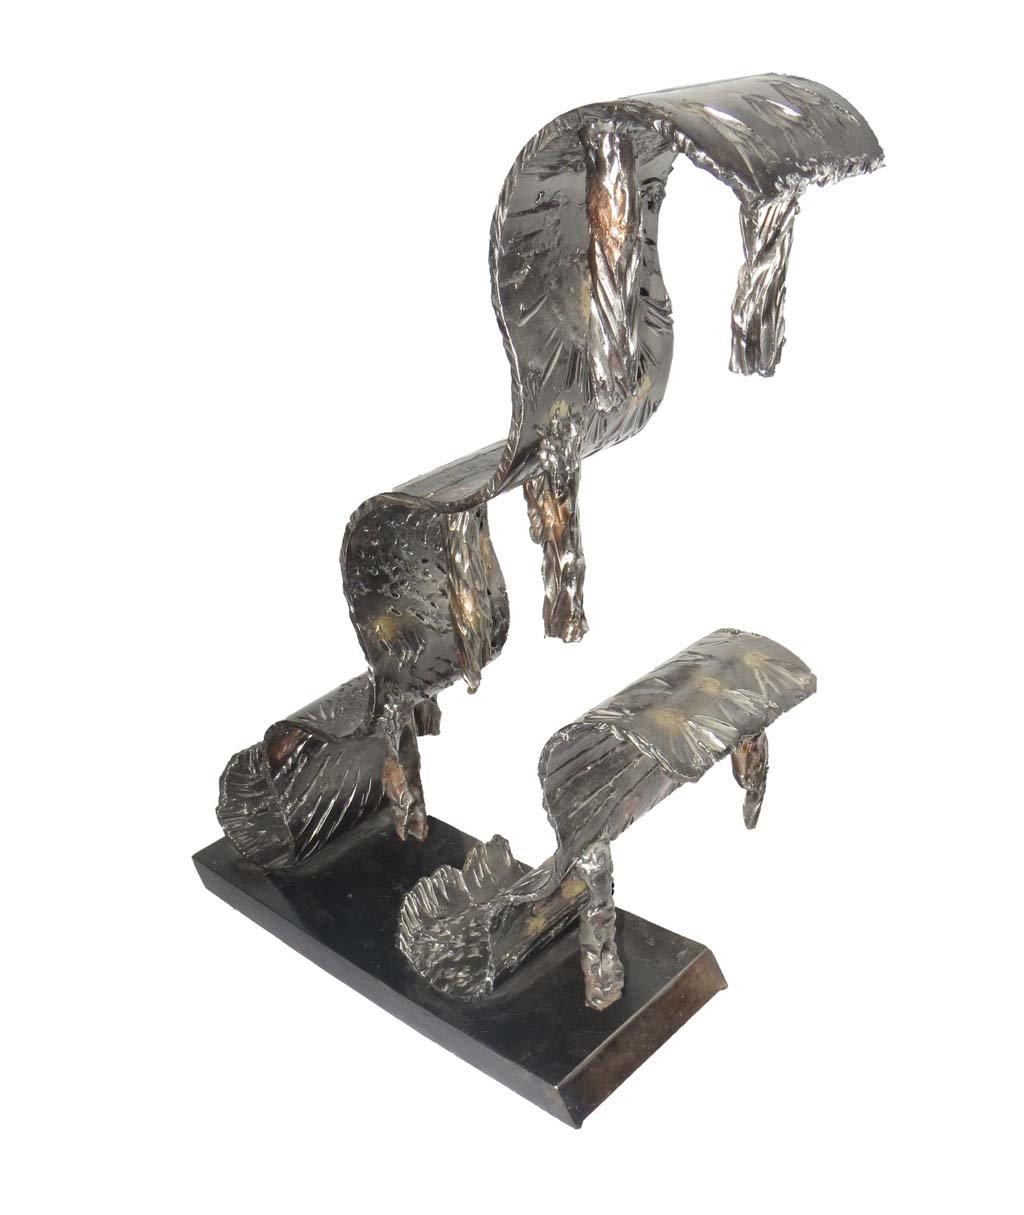 Life IV | 2013 | Iron & brass sculpture of the Israeli artist, sculptor Rami Ater